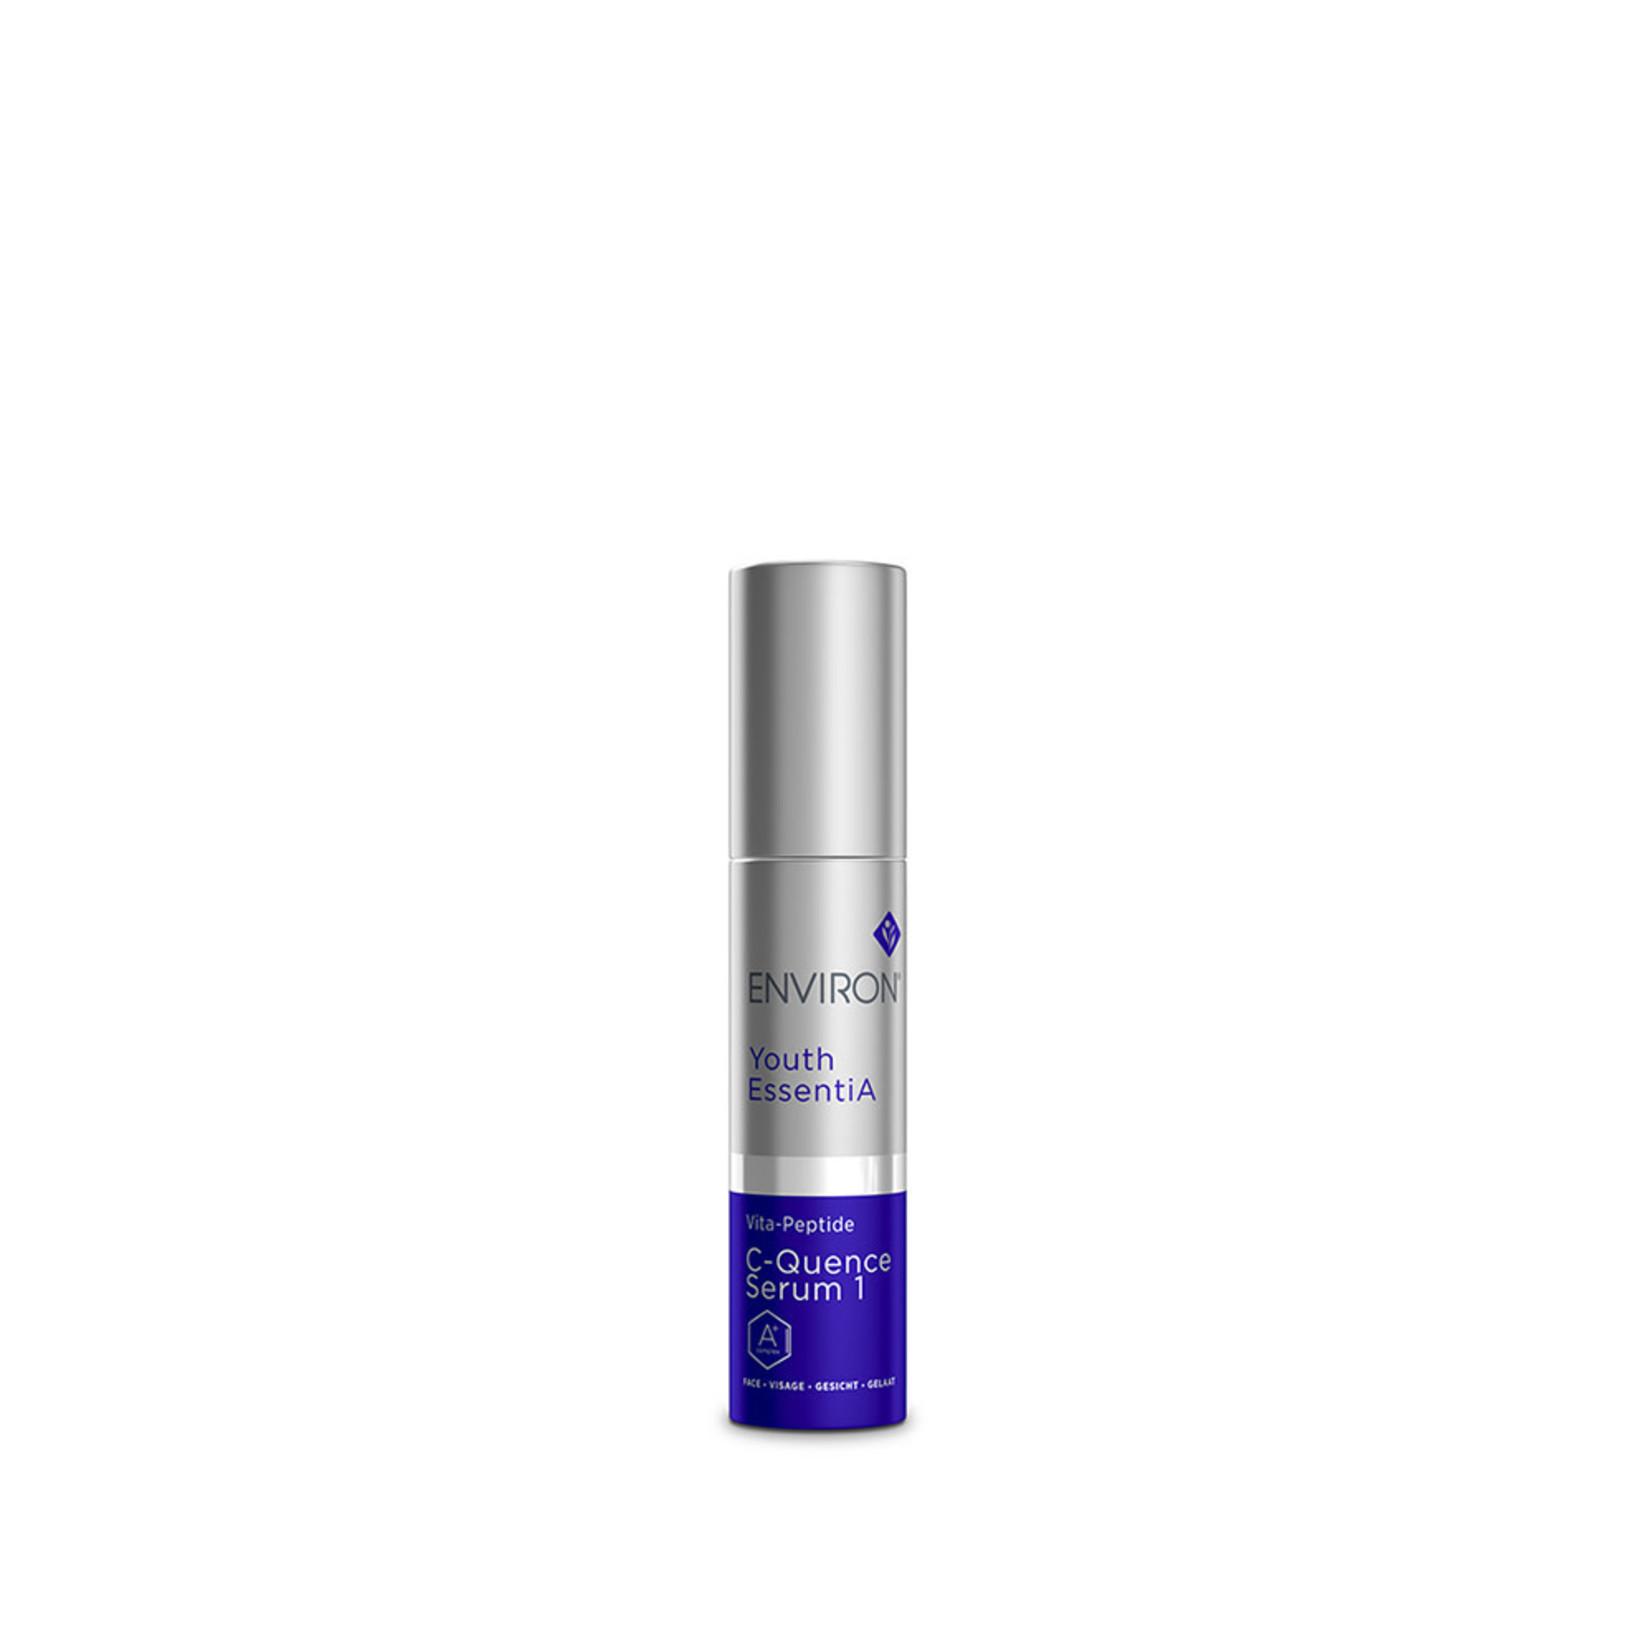 Environ Vita-peptide C-Quence serum 1 - 35ml